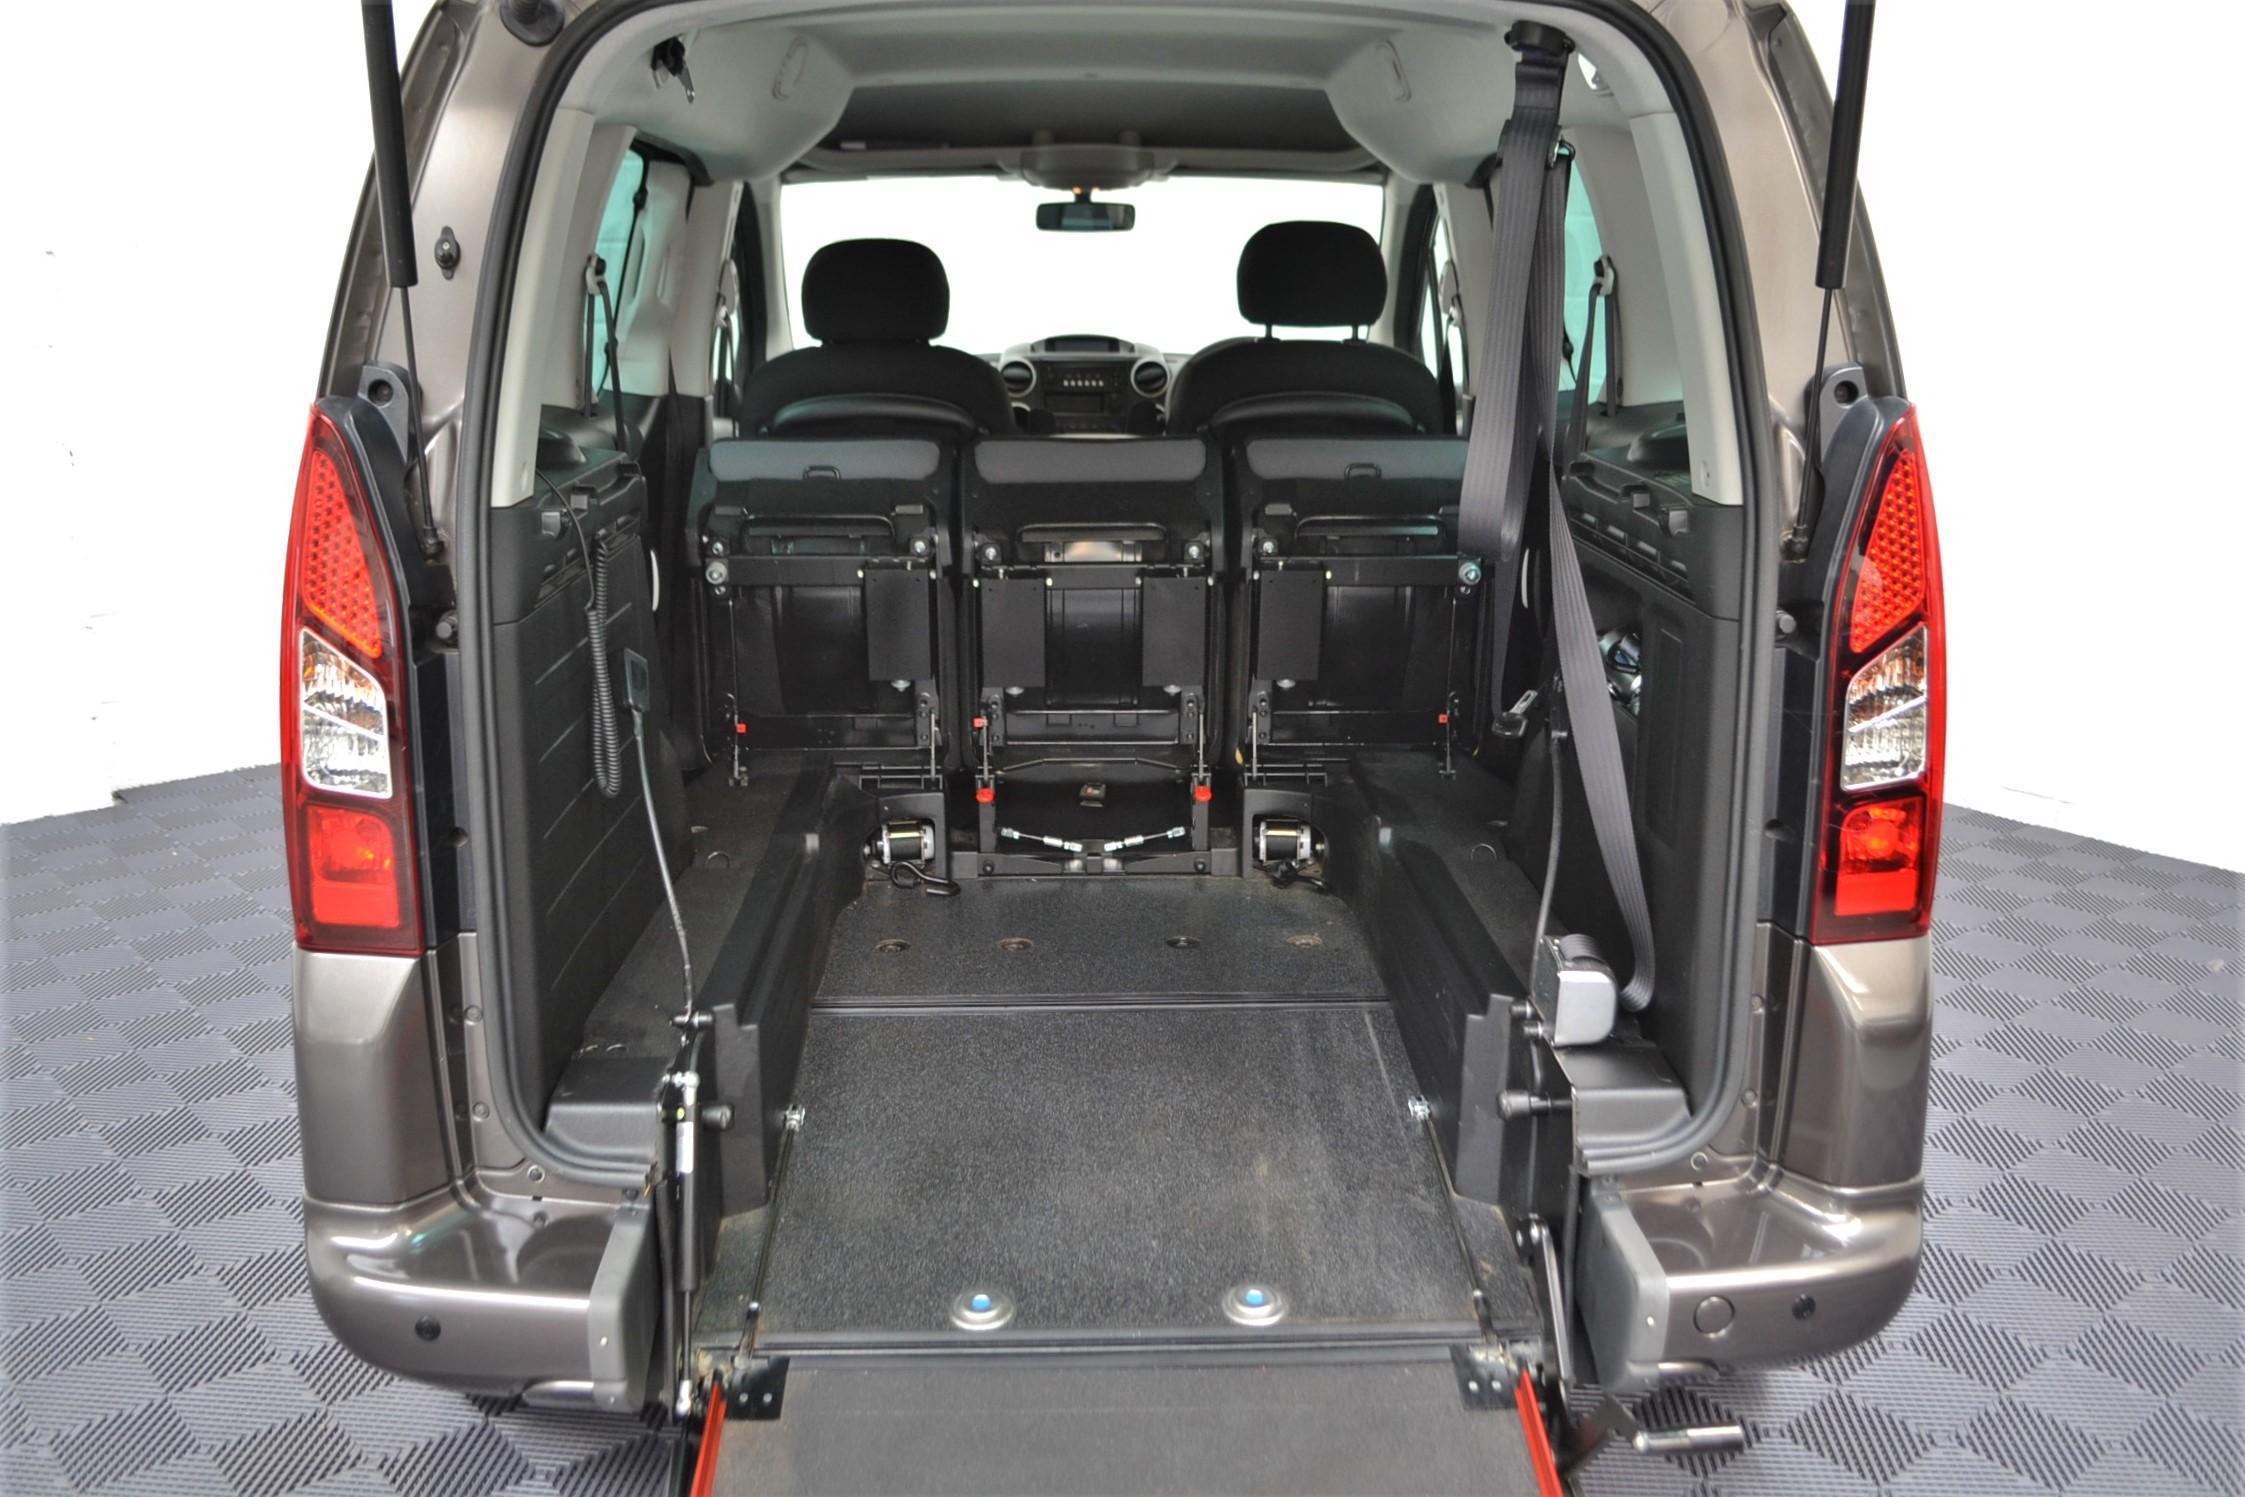 WAV Cars For Sale Bristol Wheelchair Accessible Vehicles Used For Sale Somerset Devon Dorset Bath Peugeot Partner WO16 HNH 5